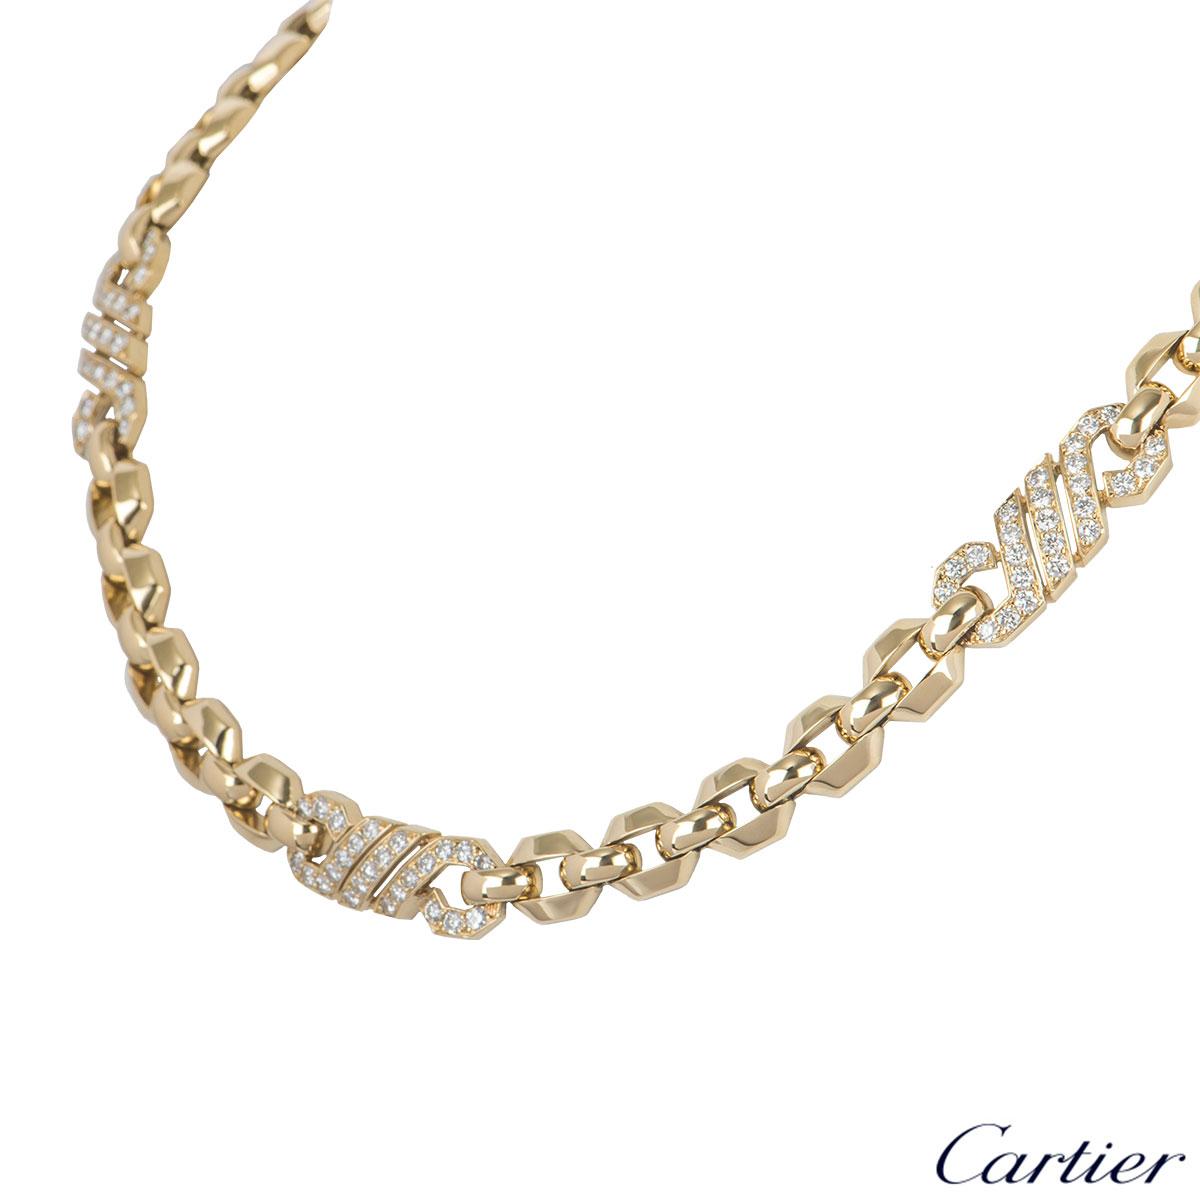 Cartier Yellow Gold Diamond Necklace